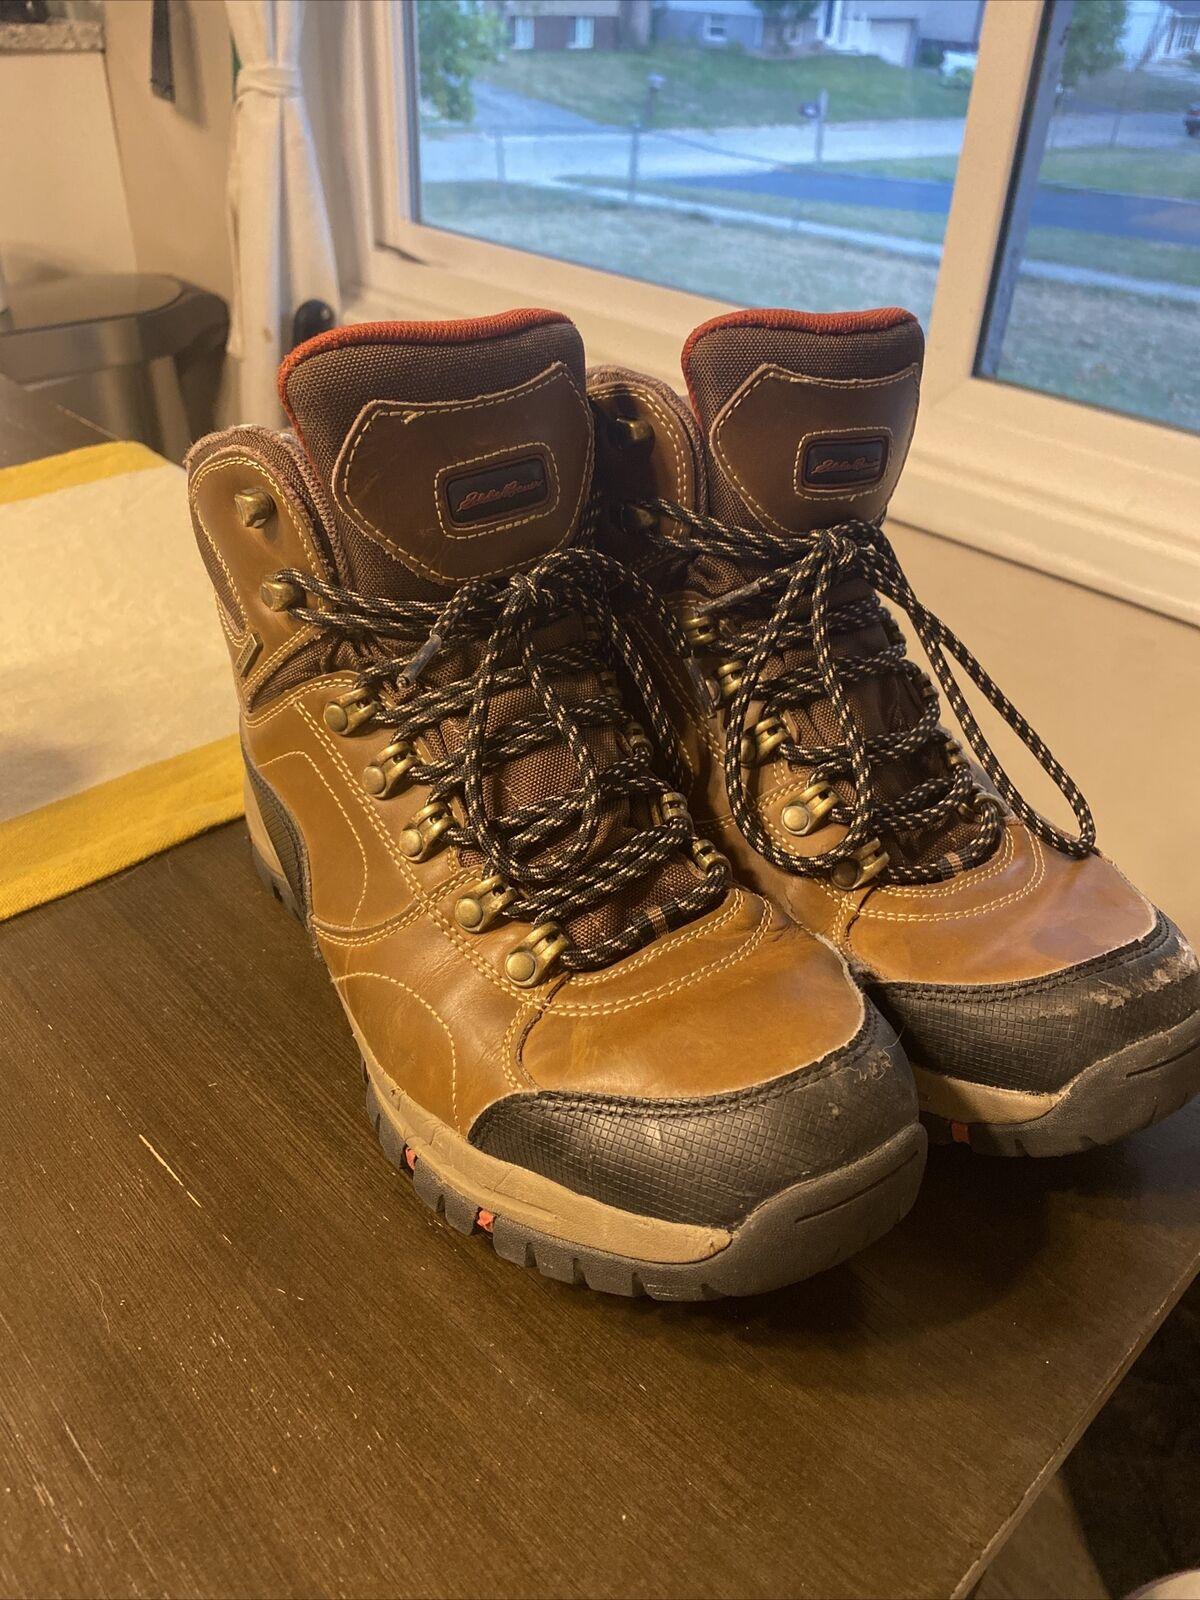 EDDIE BAUER - Men's Brandon Hiking Boots Brown Waterproof US Size 9.5 Leather